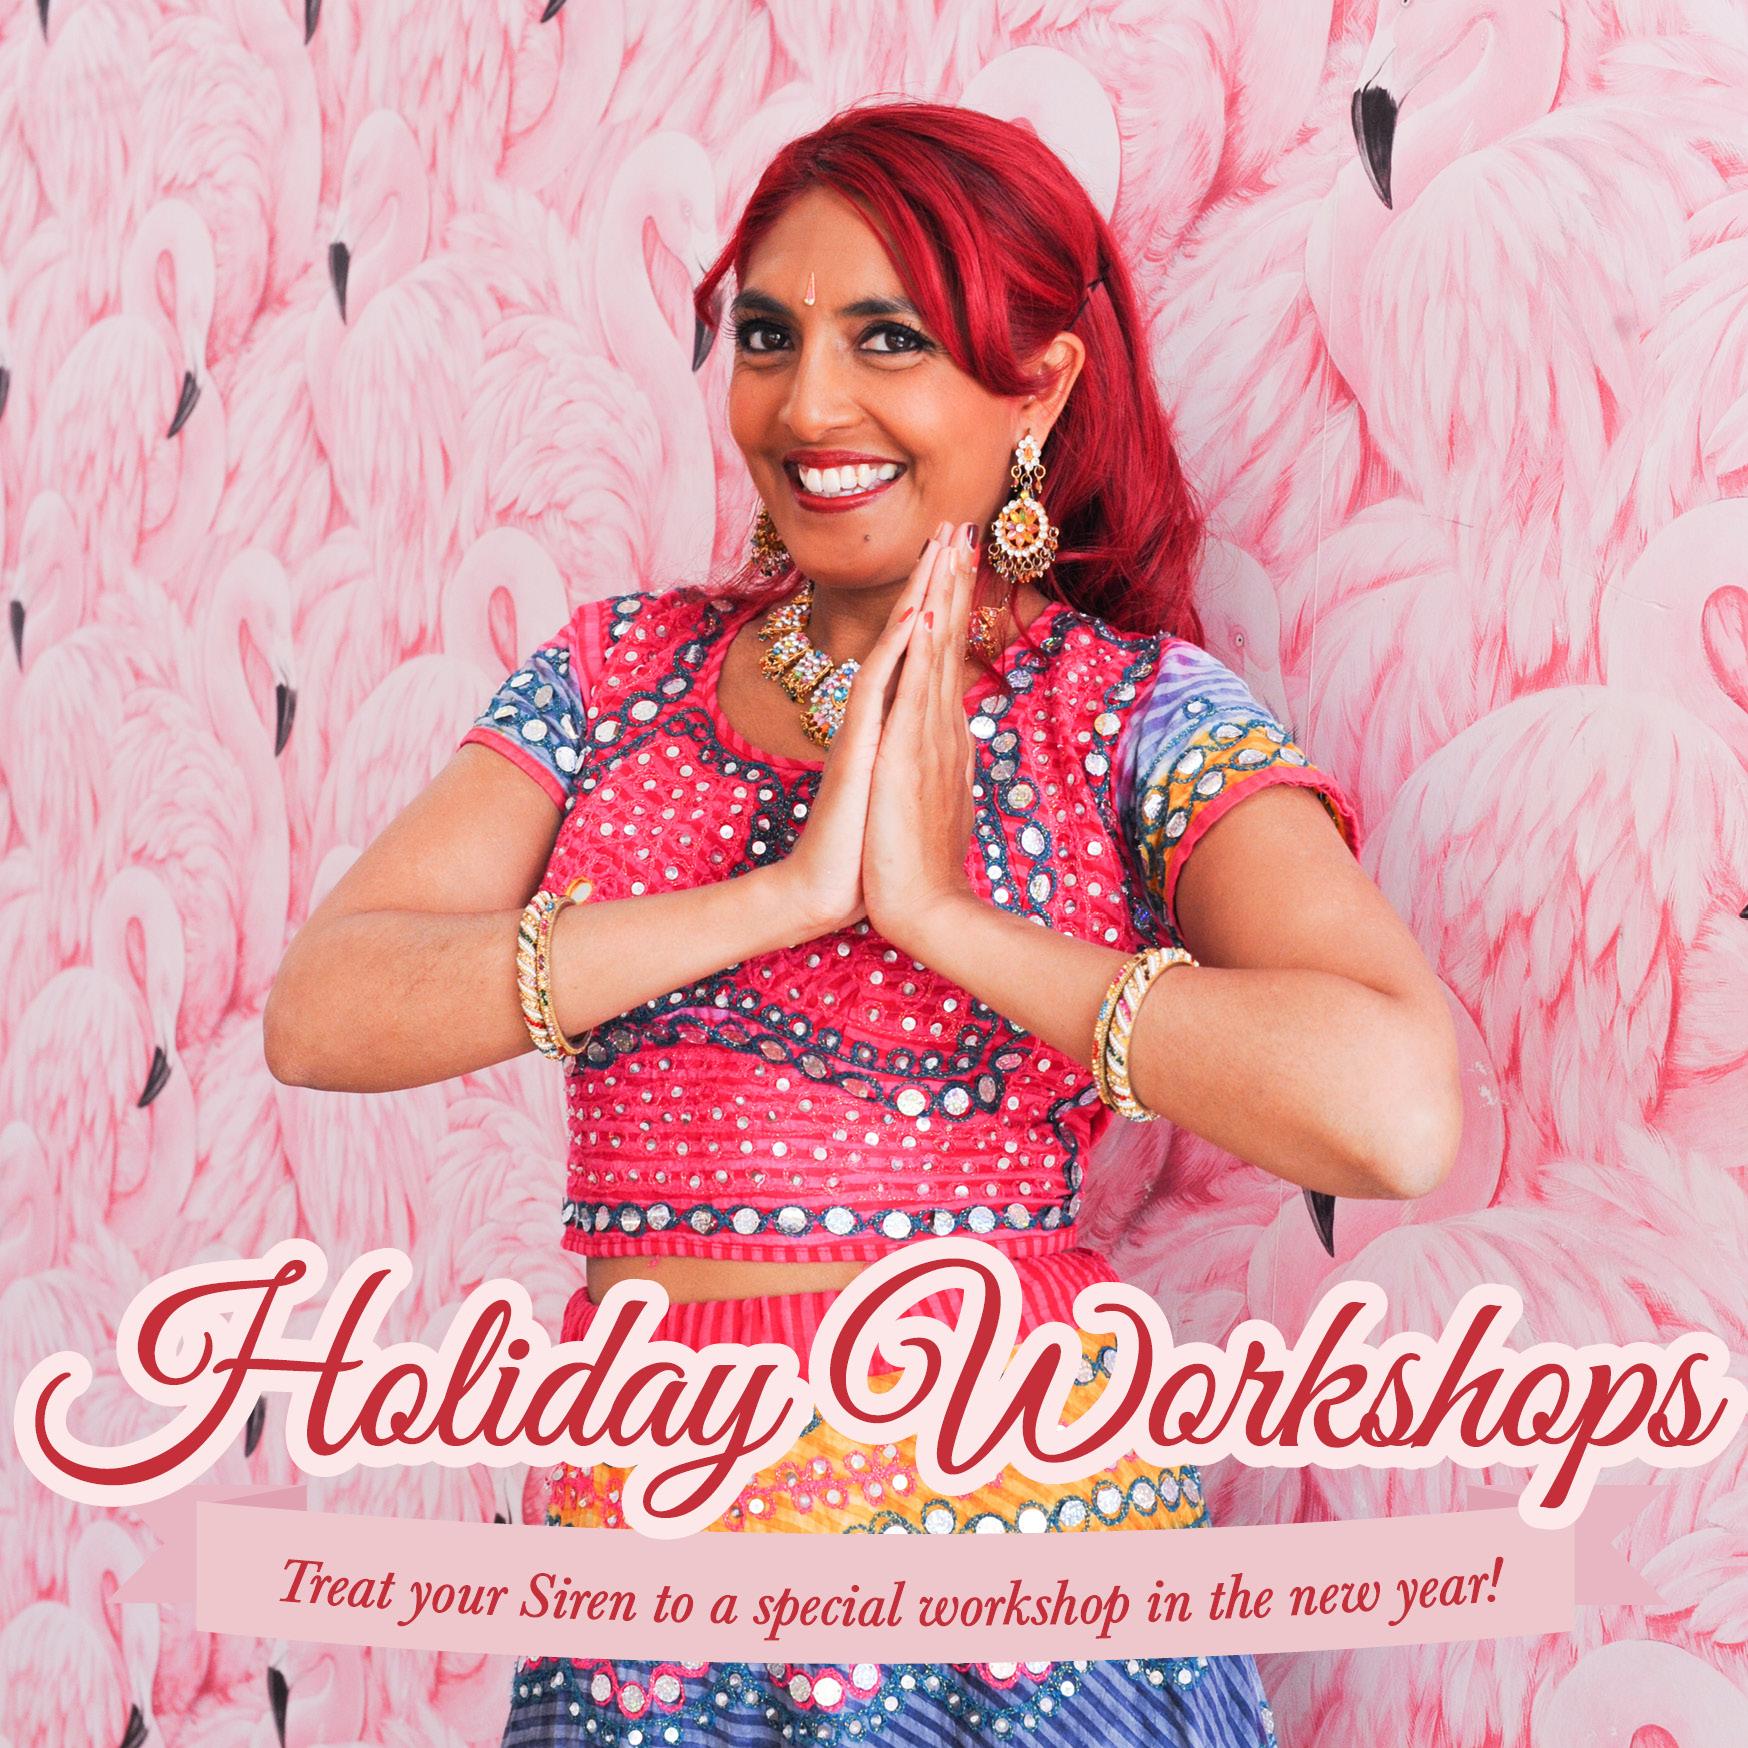 Holiday Workshops.jpg